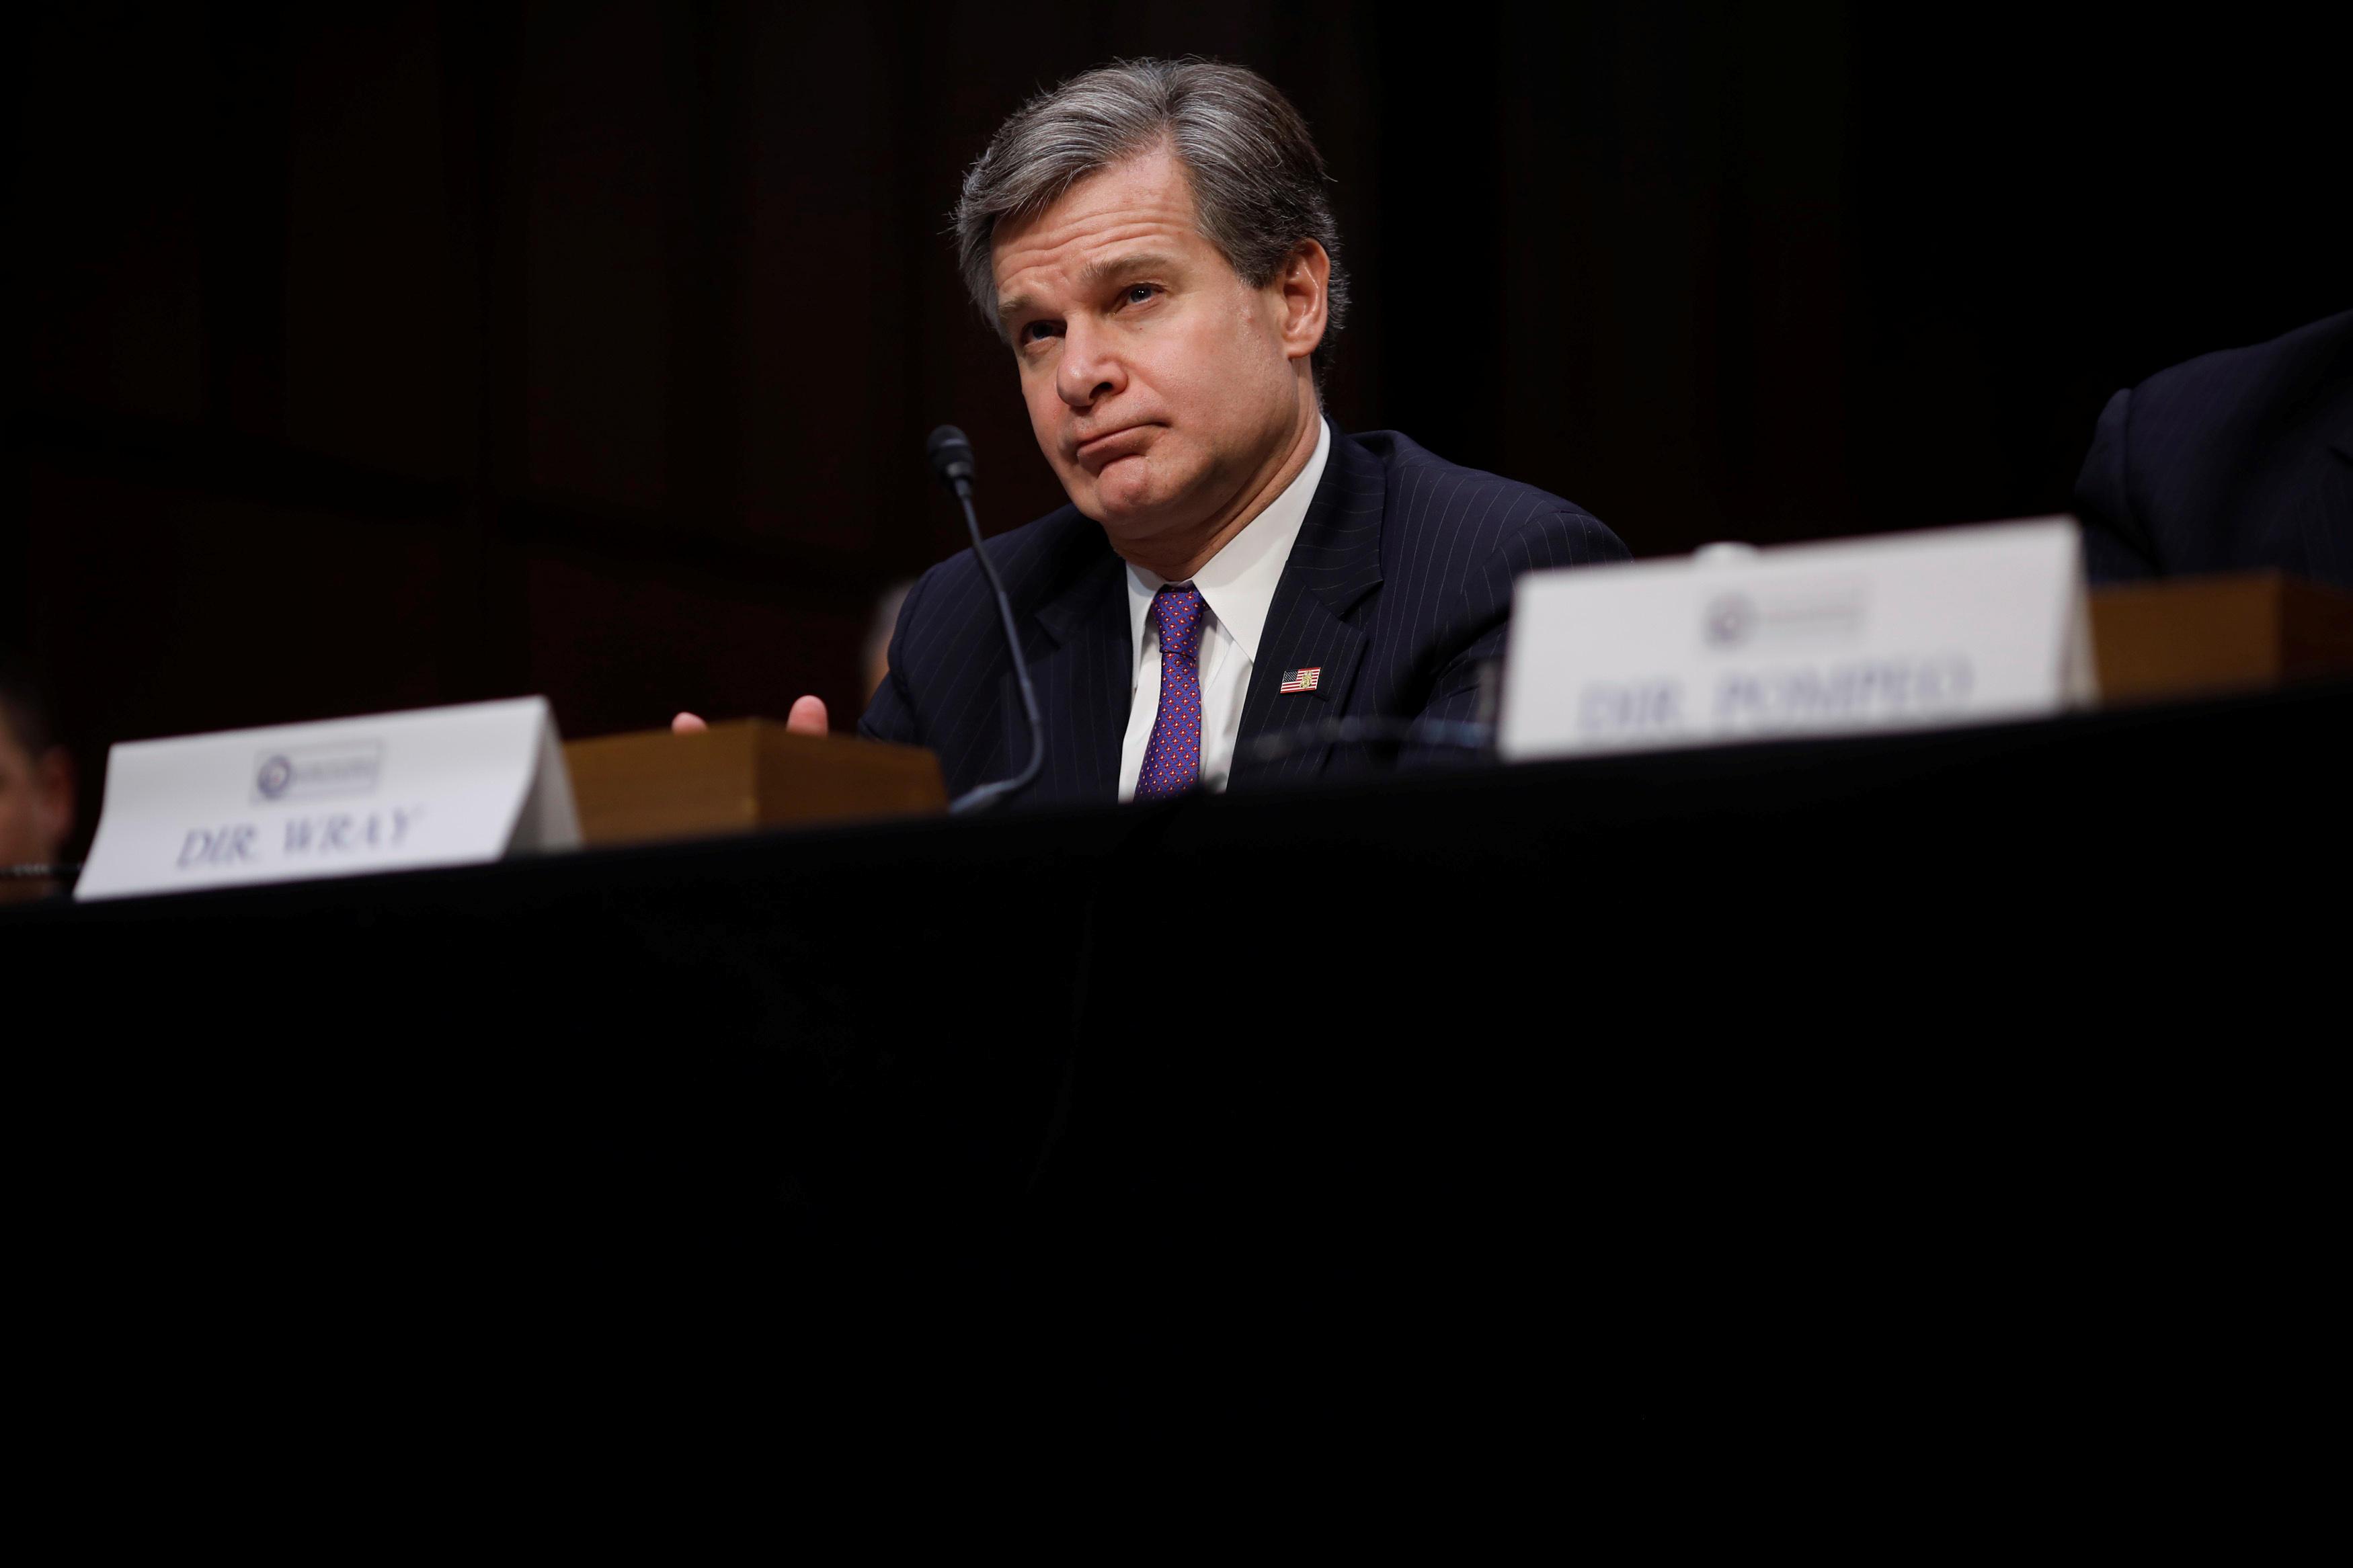 Senate panel holds hearing on DOJ's Inspector General report